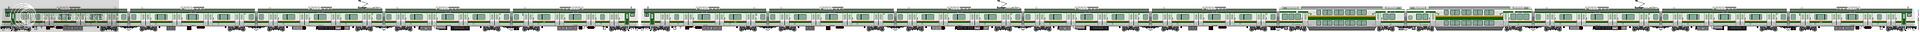 Train 1960